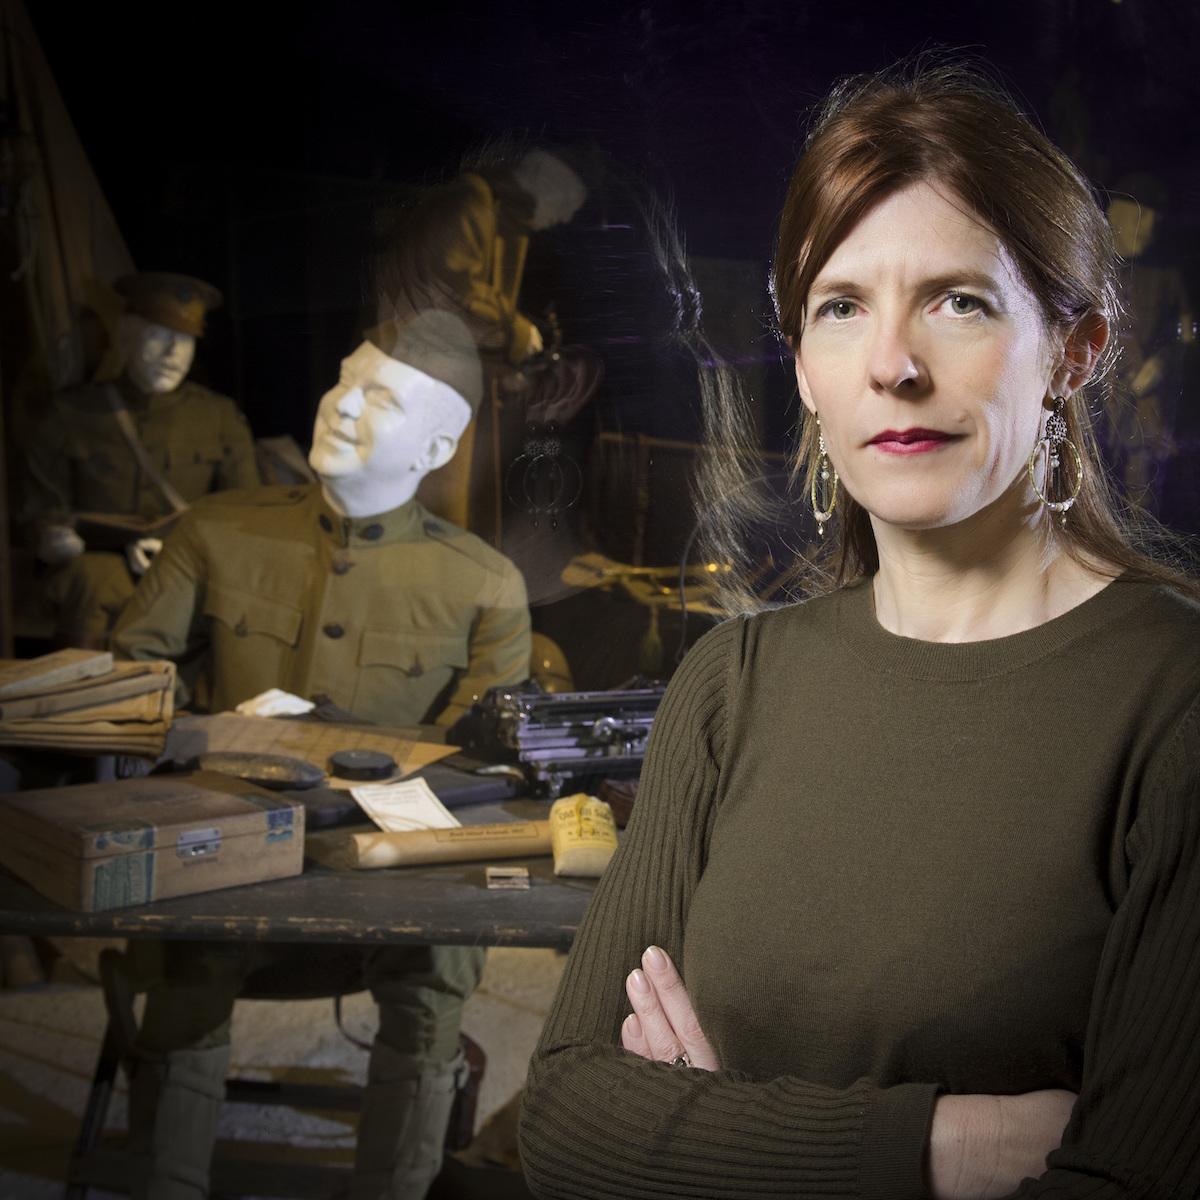 Entretien avec Fabienne Vandenbrouck, conservatrice-restauratrice